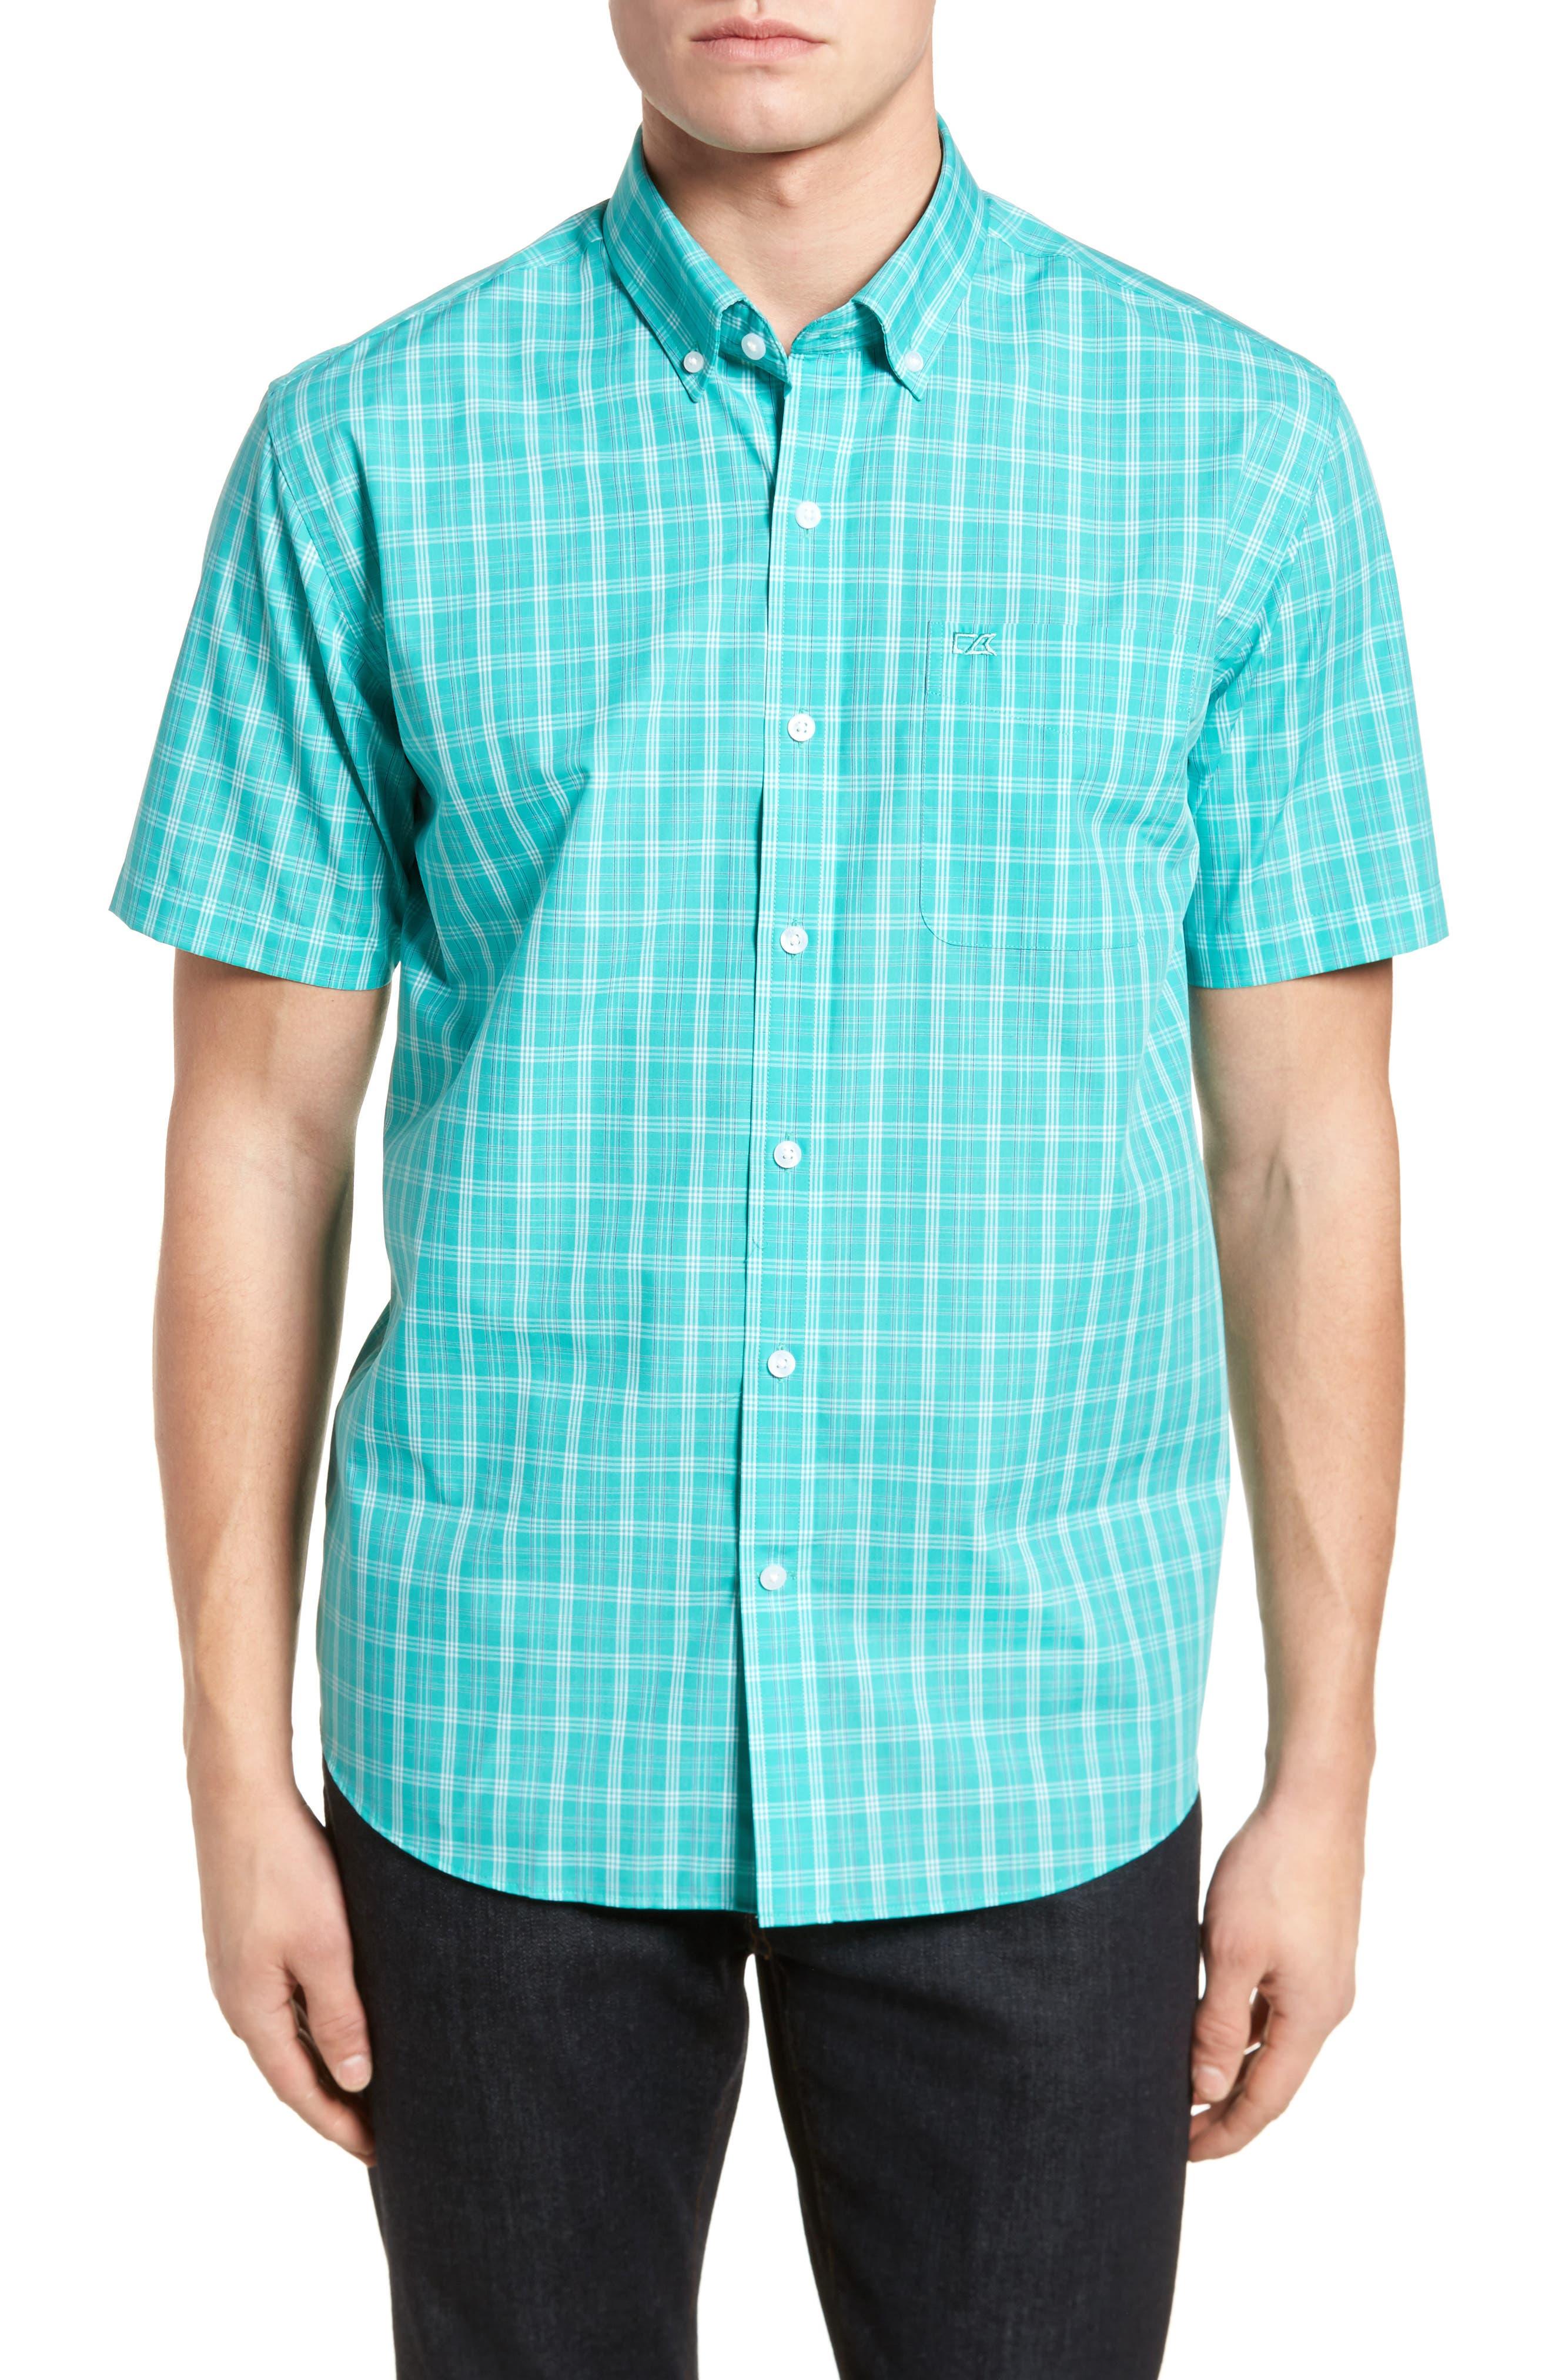 Cutter & Buck Leo Plaid Easy Care Woven Shirt